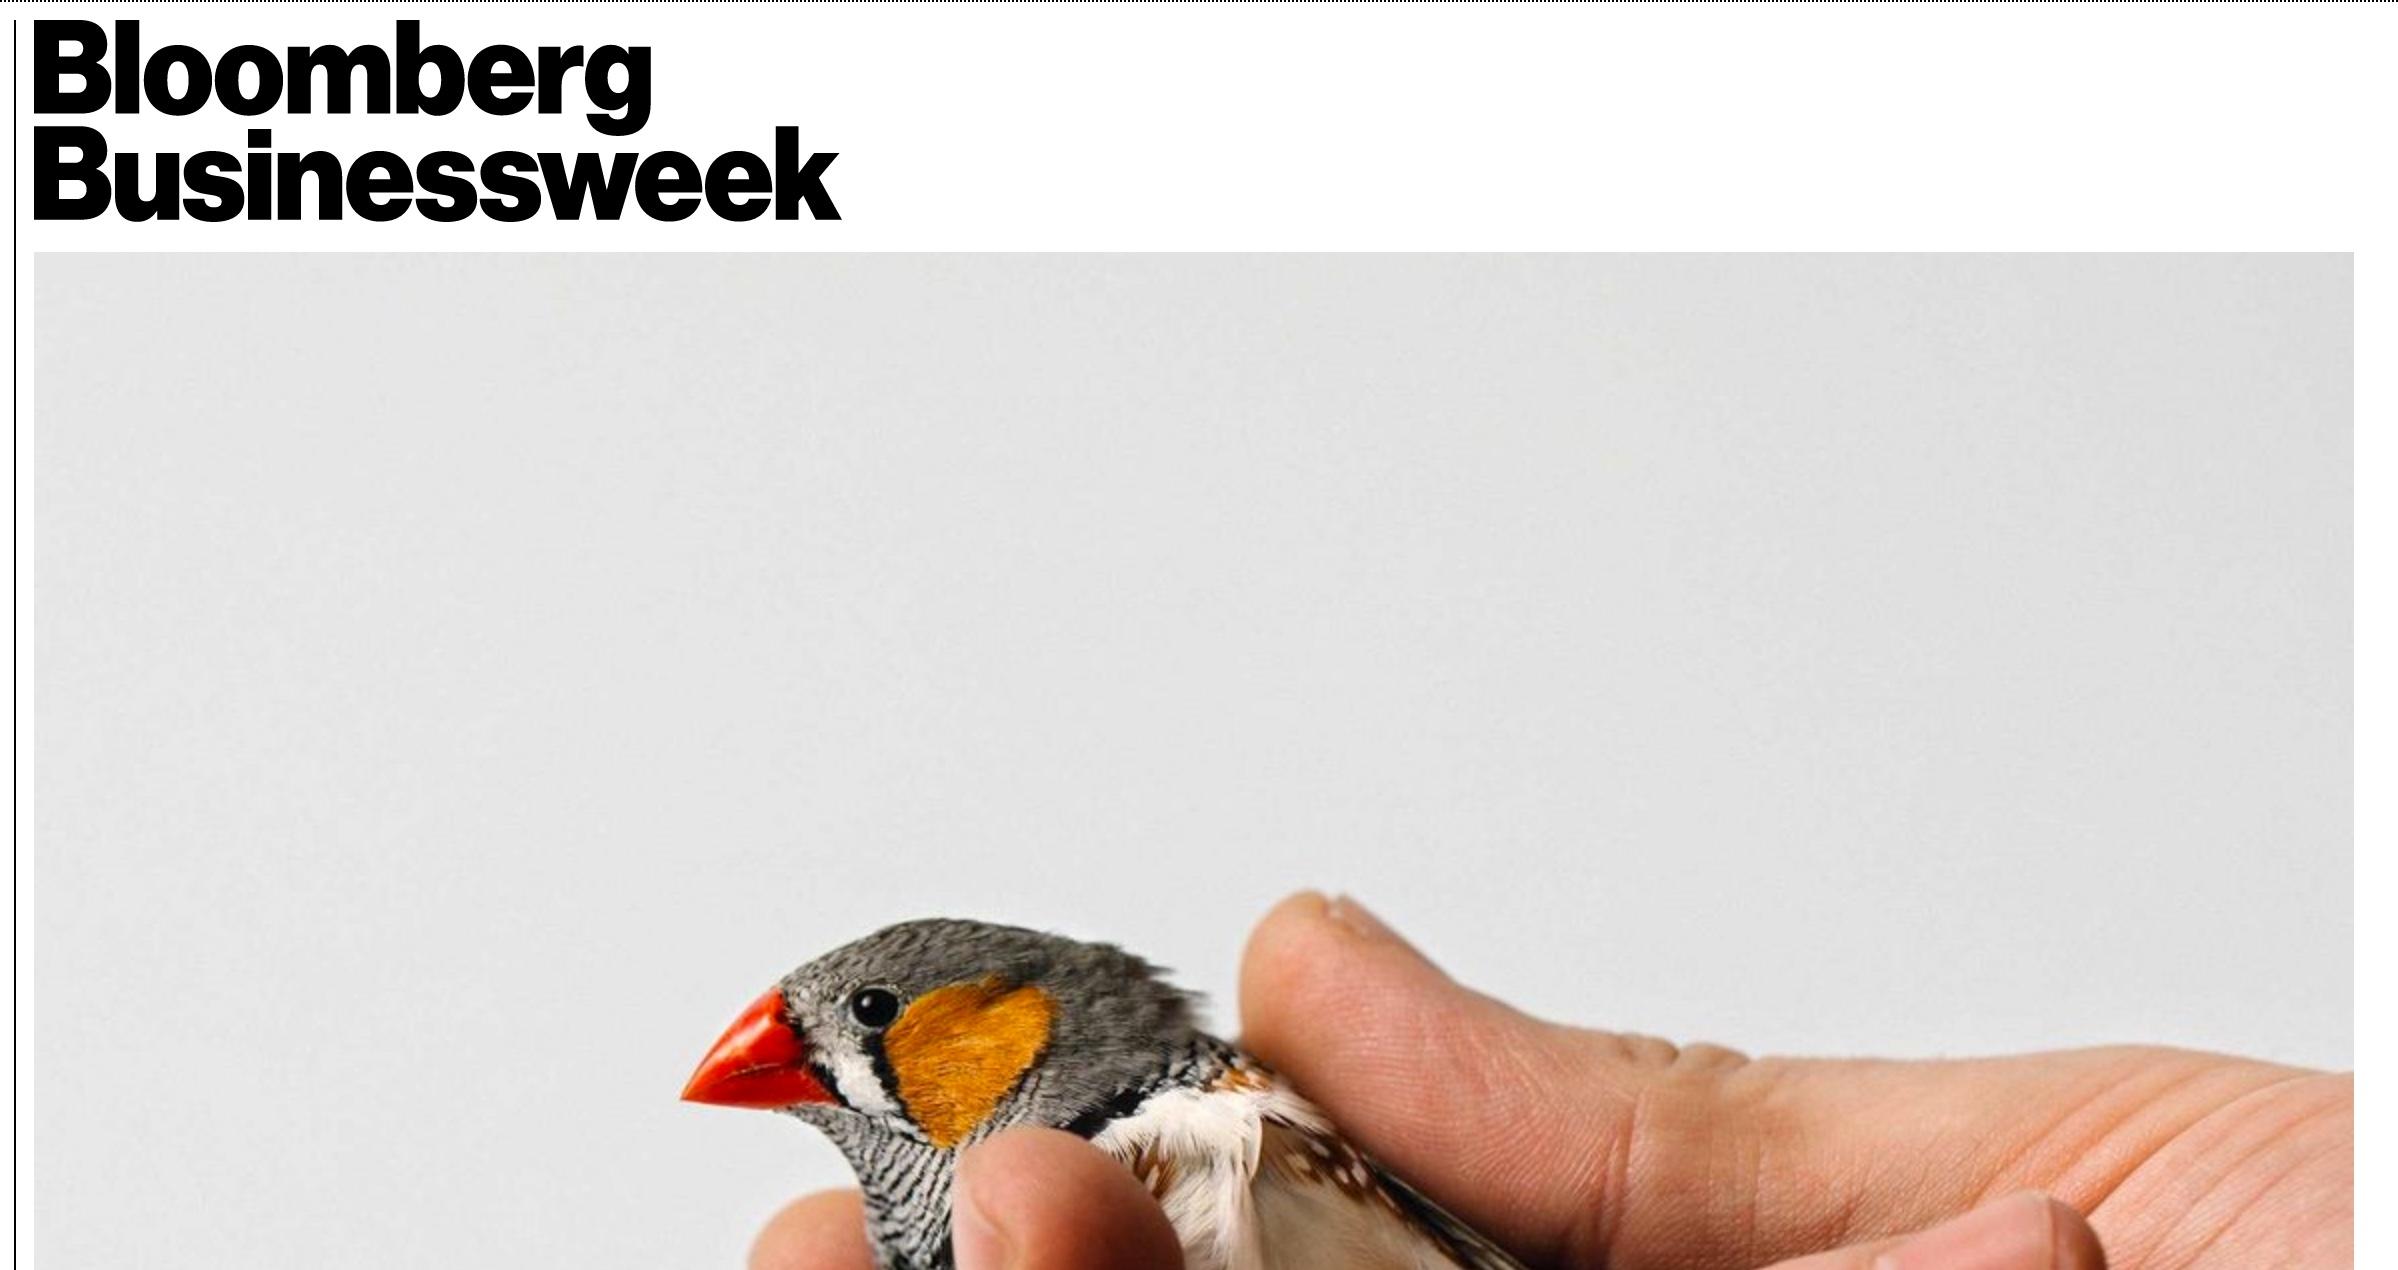 bloomberg businessweek.jpeg